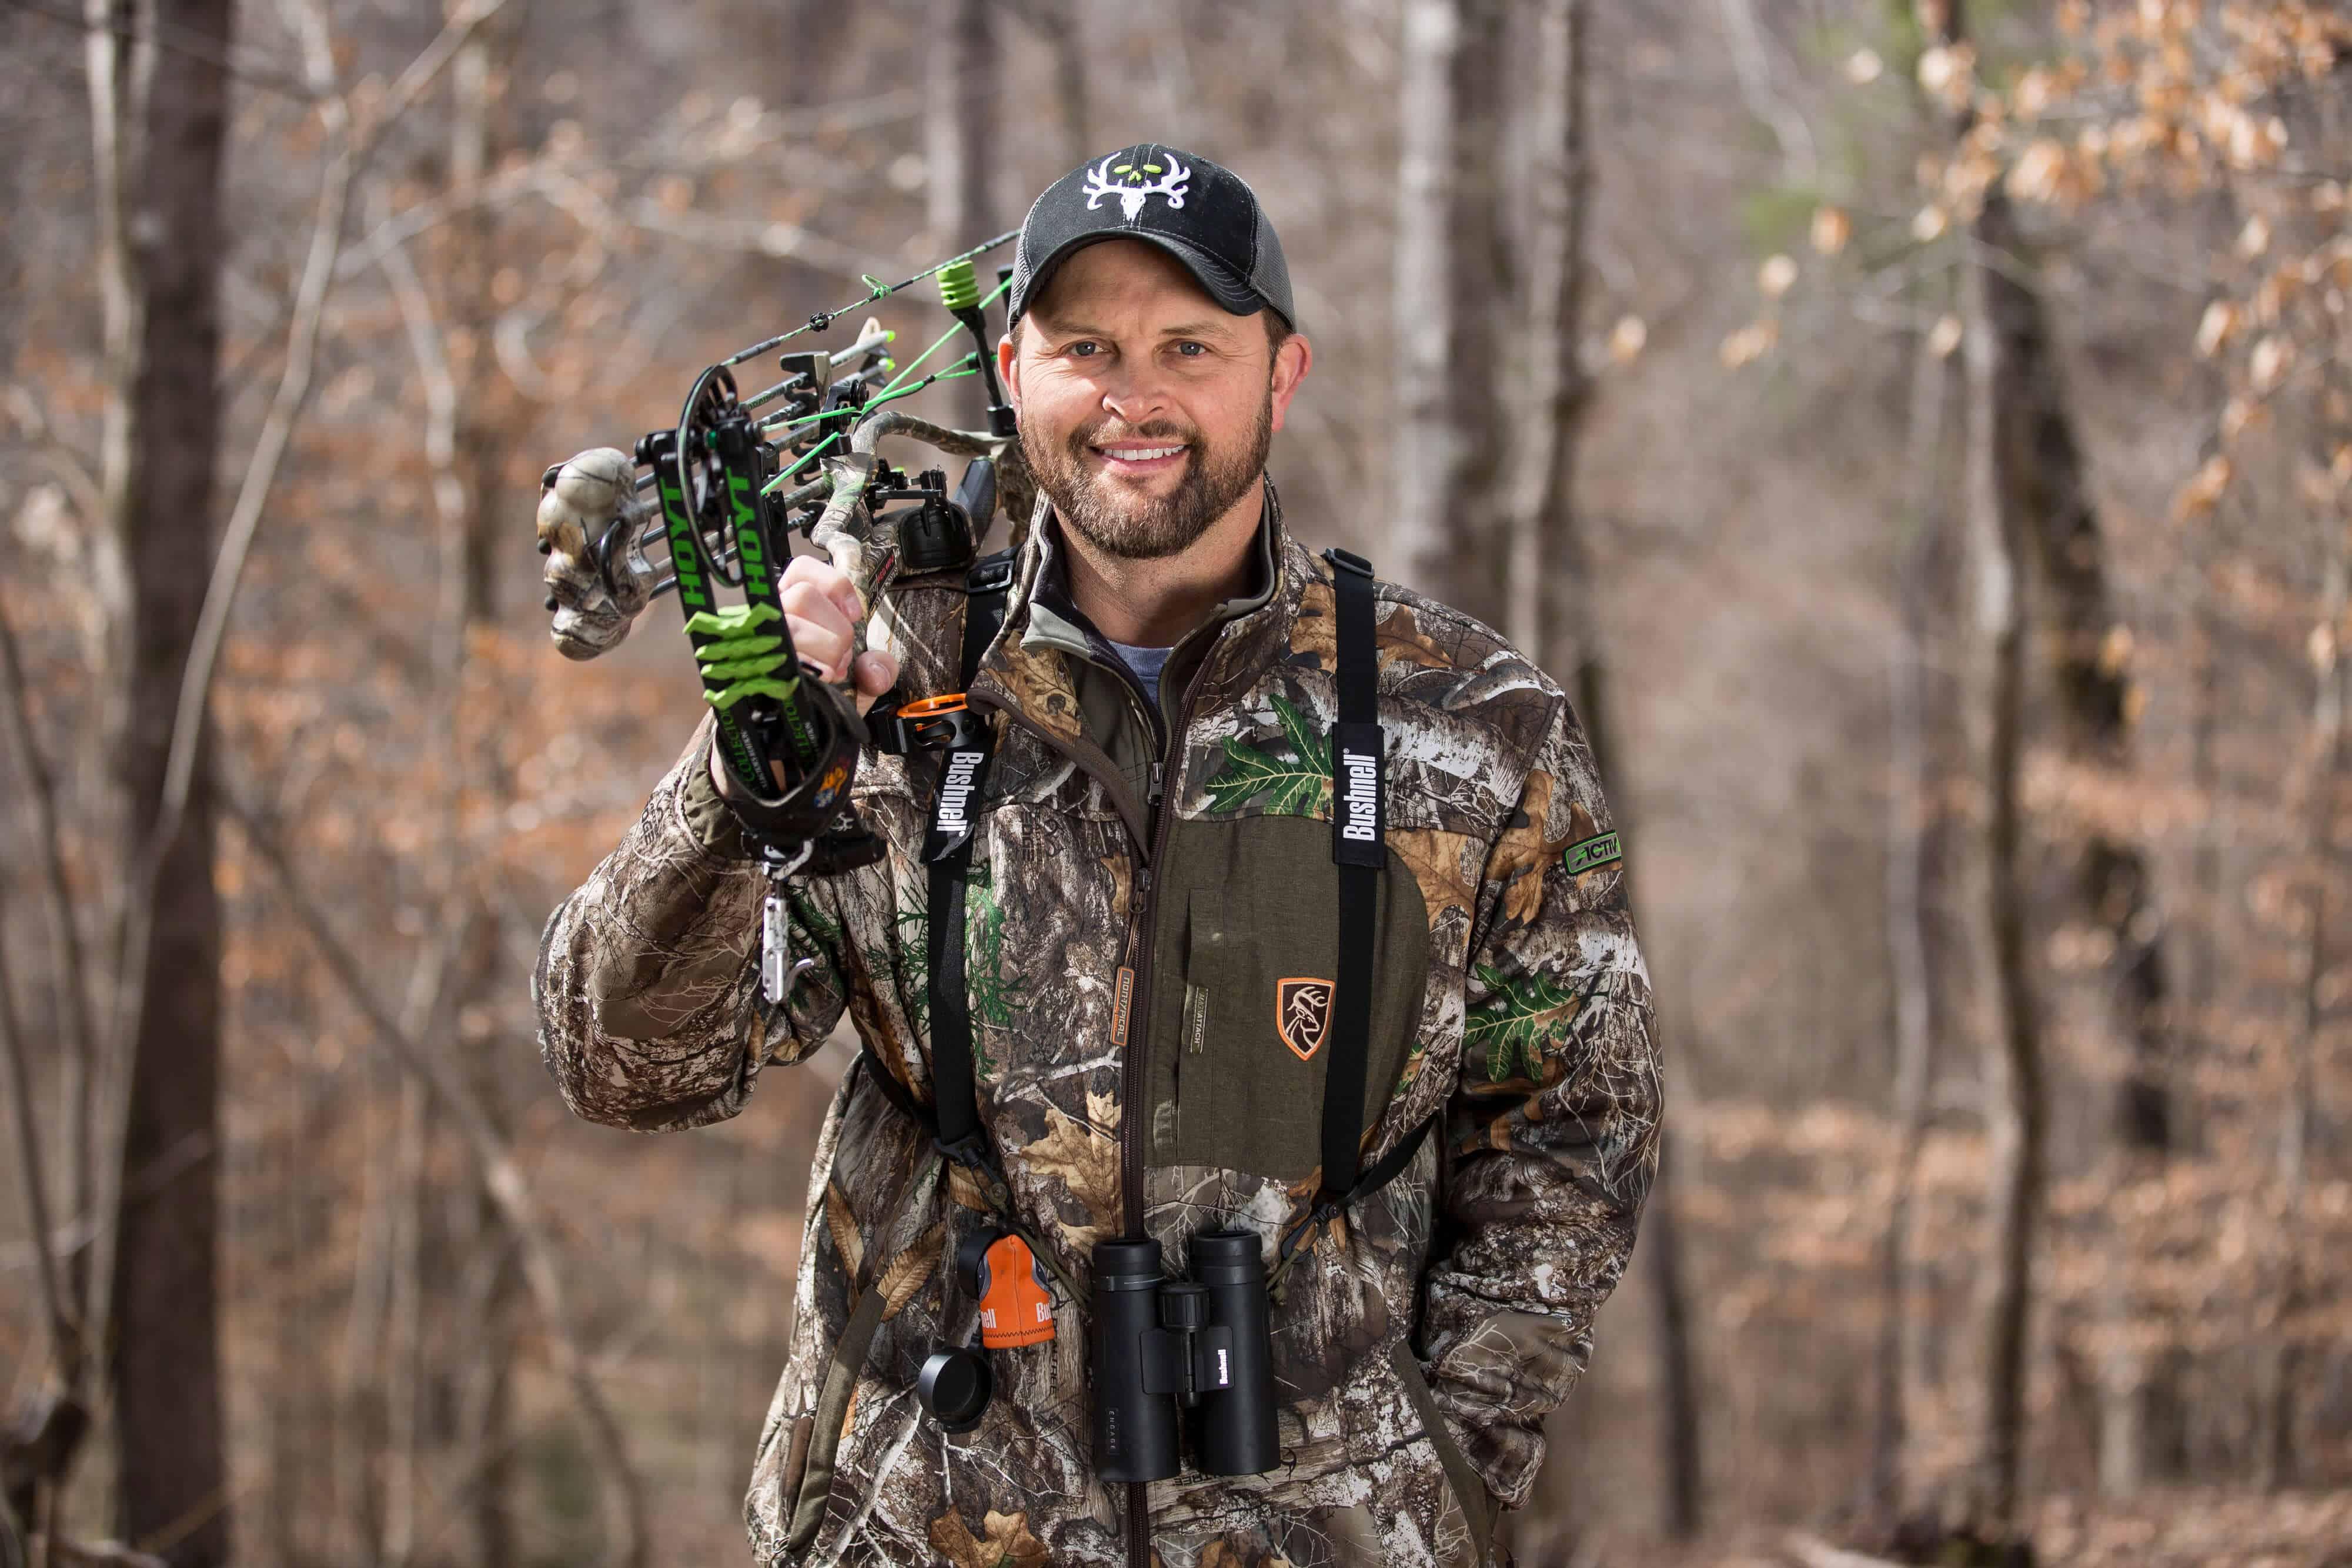 Bow hunter Michael Waddell